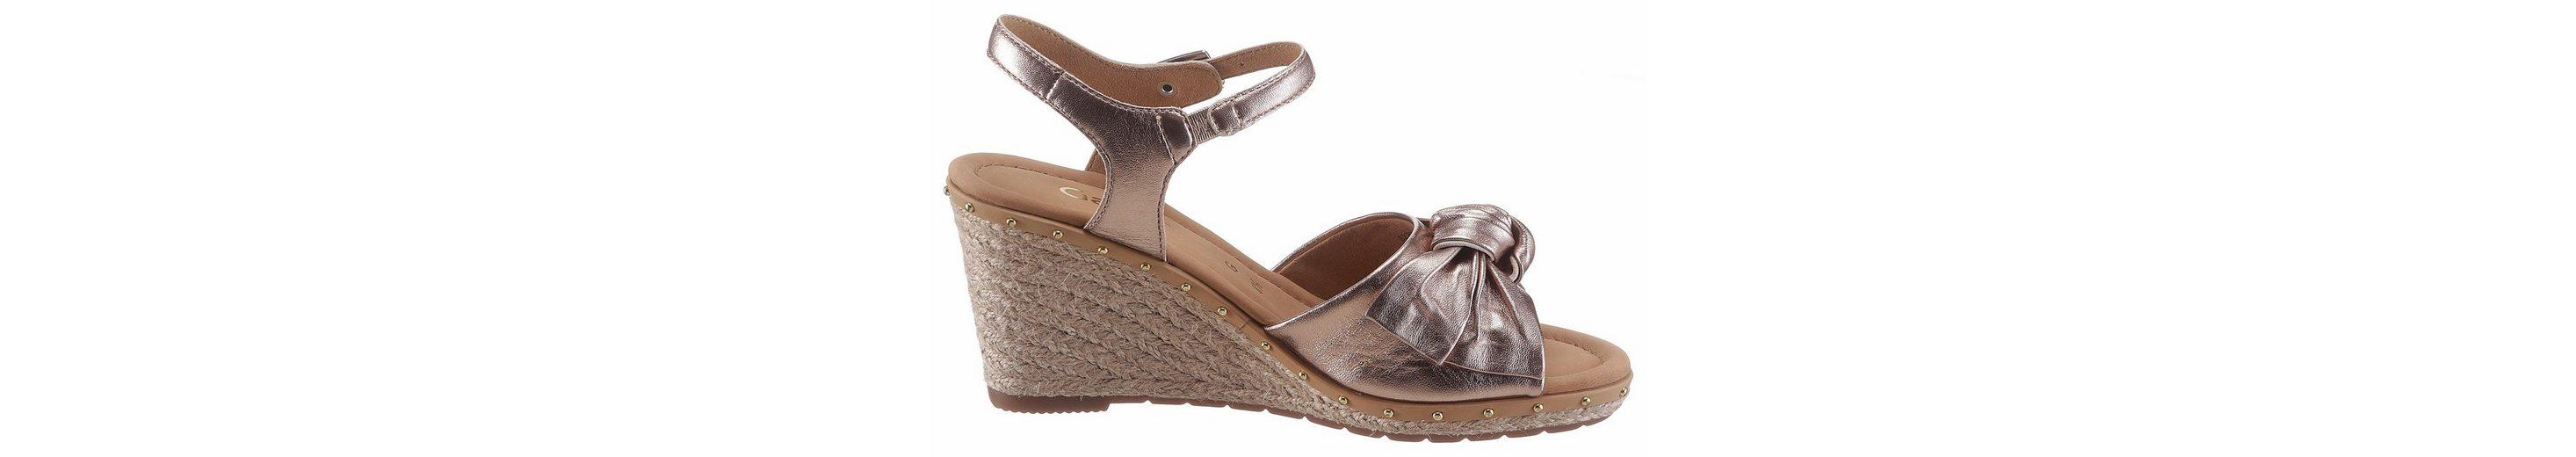 Gabor Sandalette, im trendigen Metallic Look mit Nieten besetz